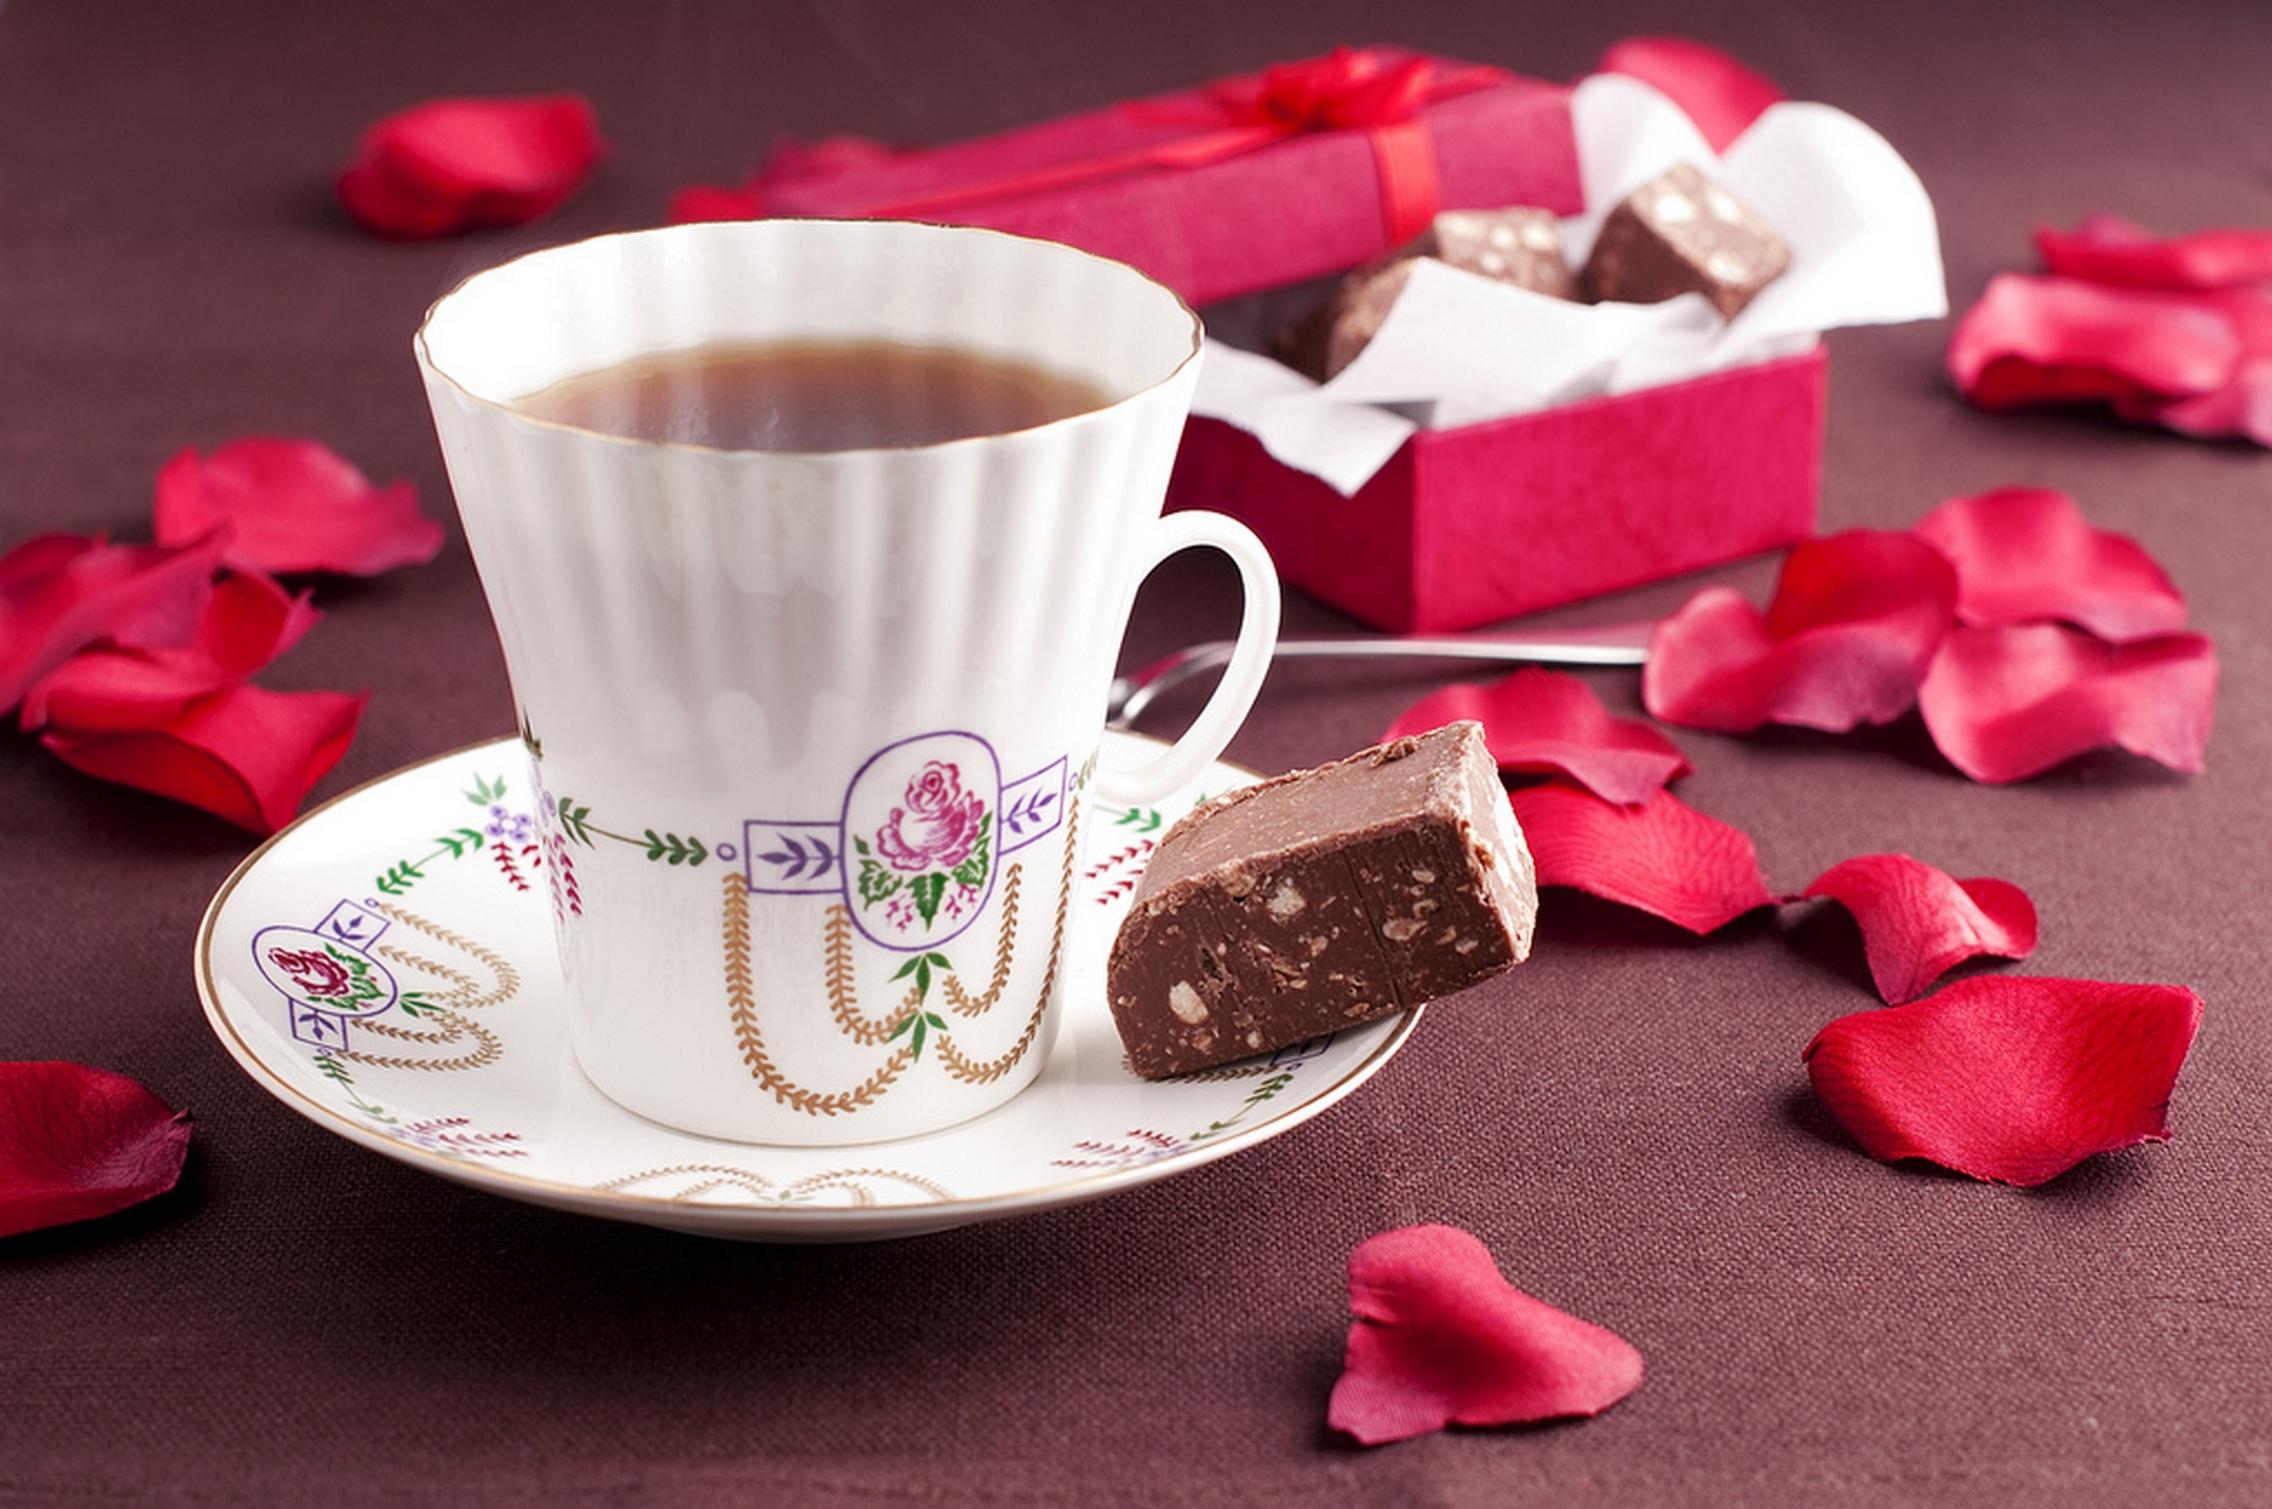 Картинки про, кофе с конфетами открытки